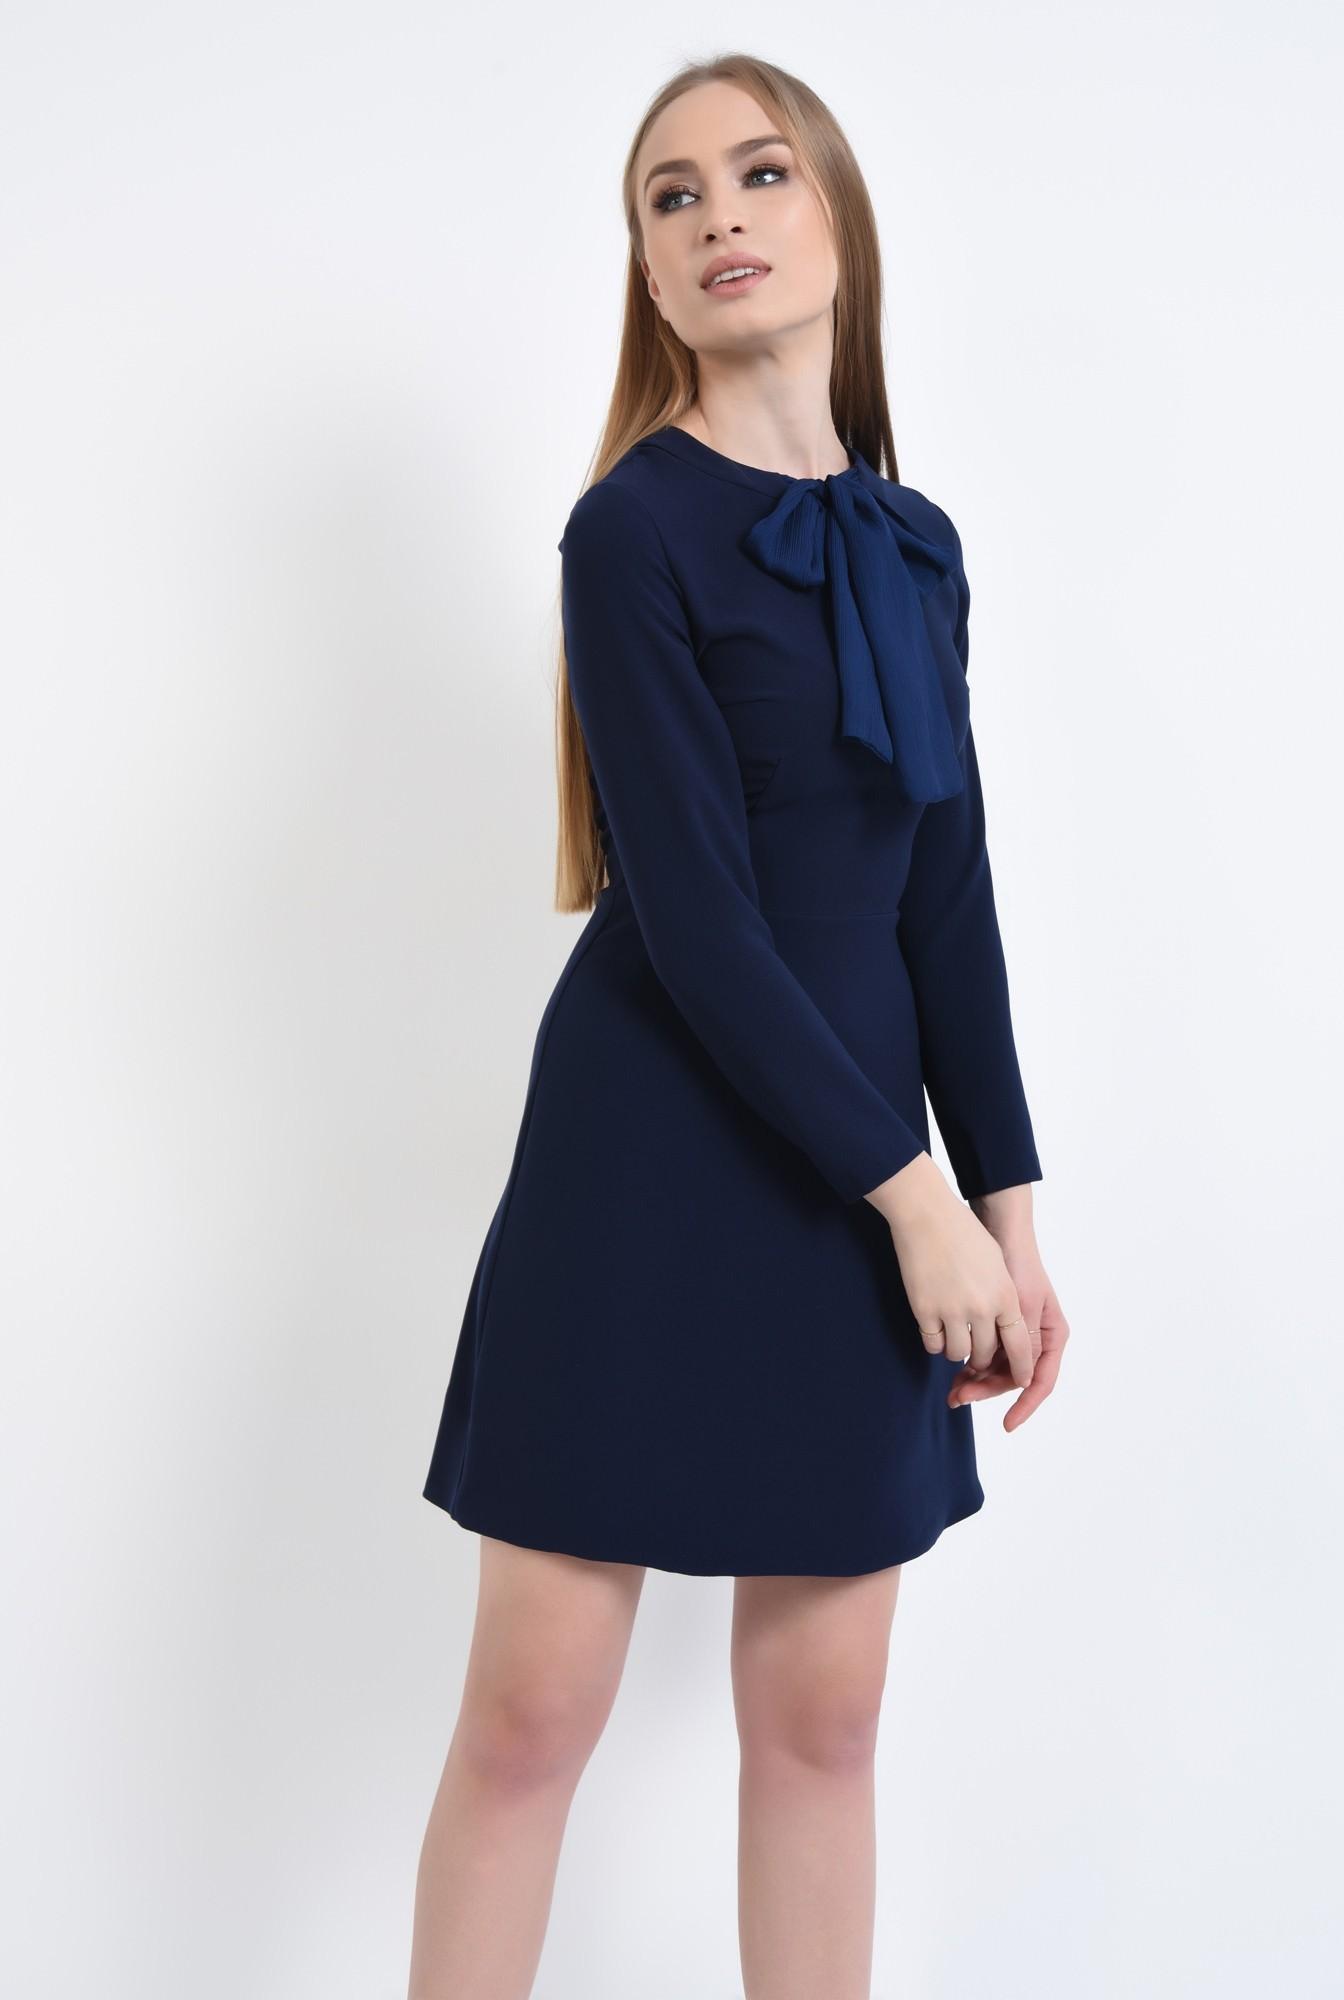 3 - rochie mini, croi A-line, talie cambrata, rochii online